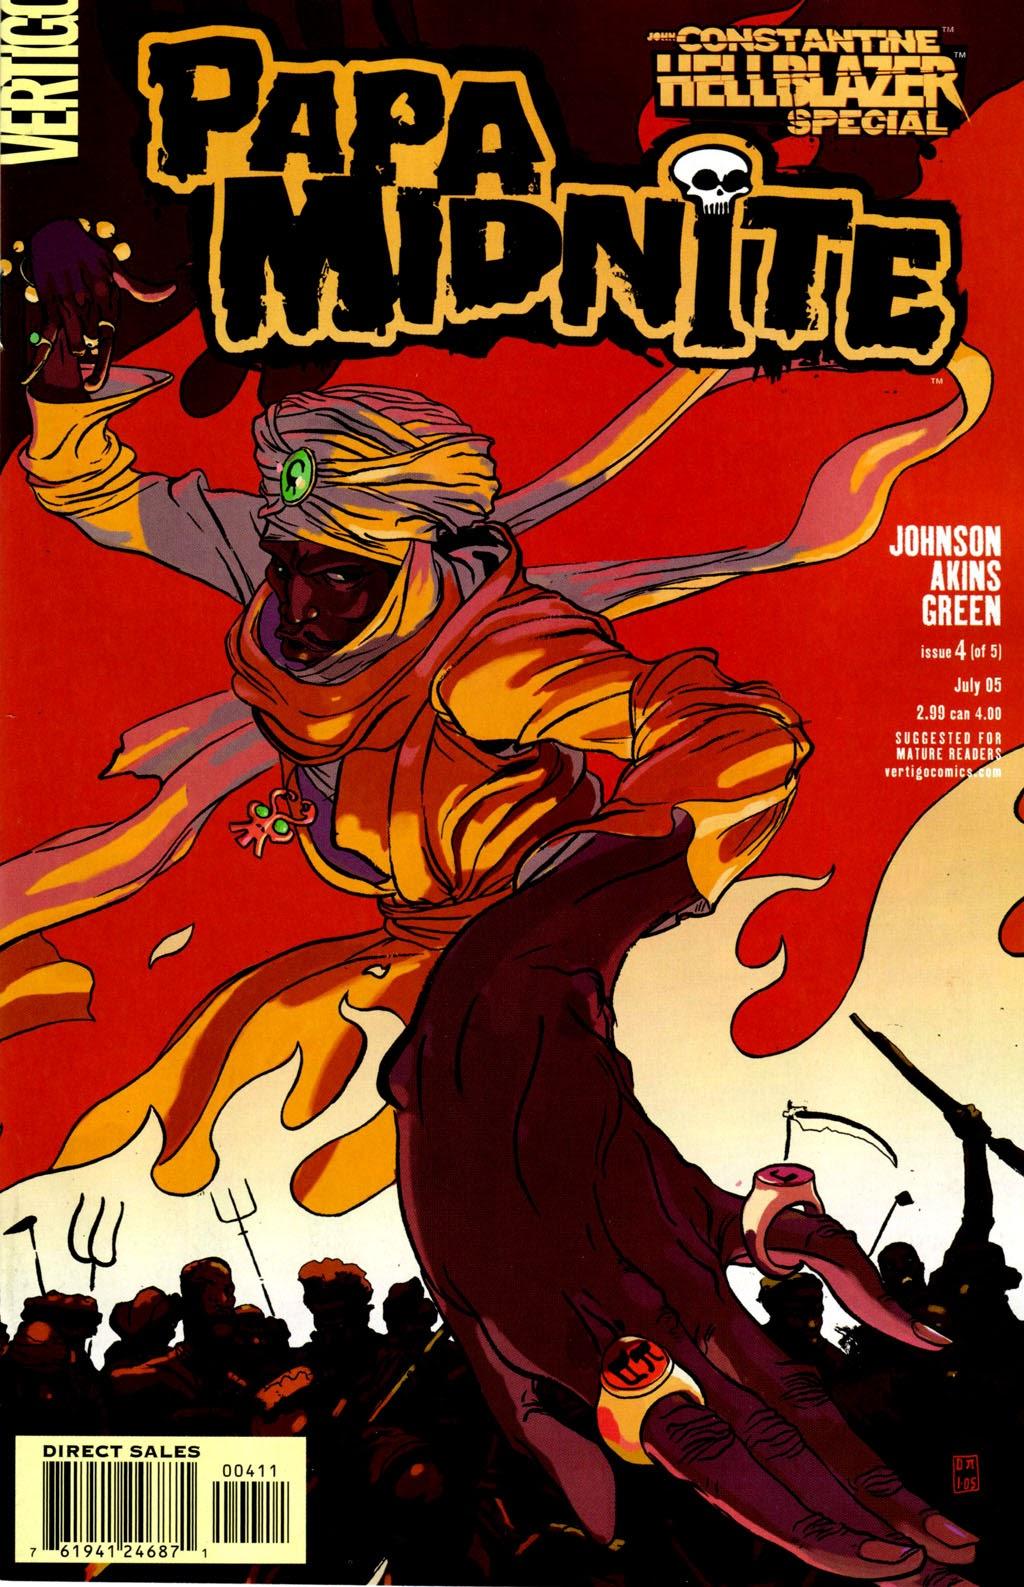 John Constantine - Hellblazer Special: Papa Midnite issue 4 - Page 1